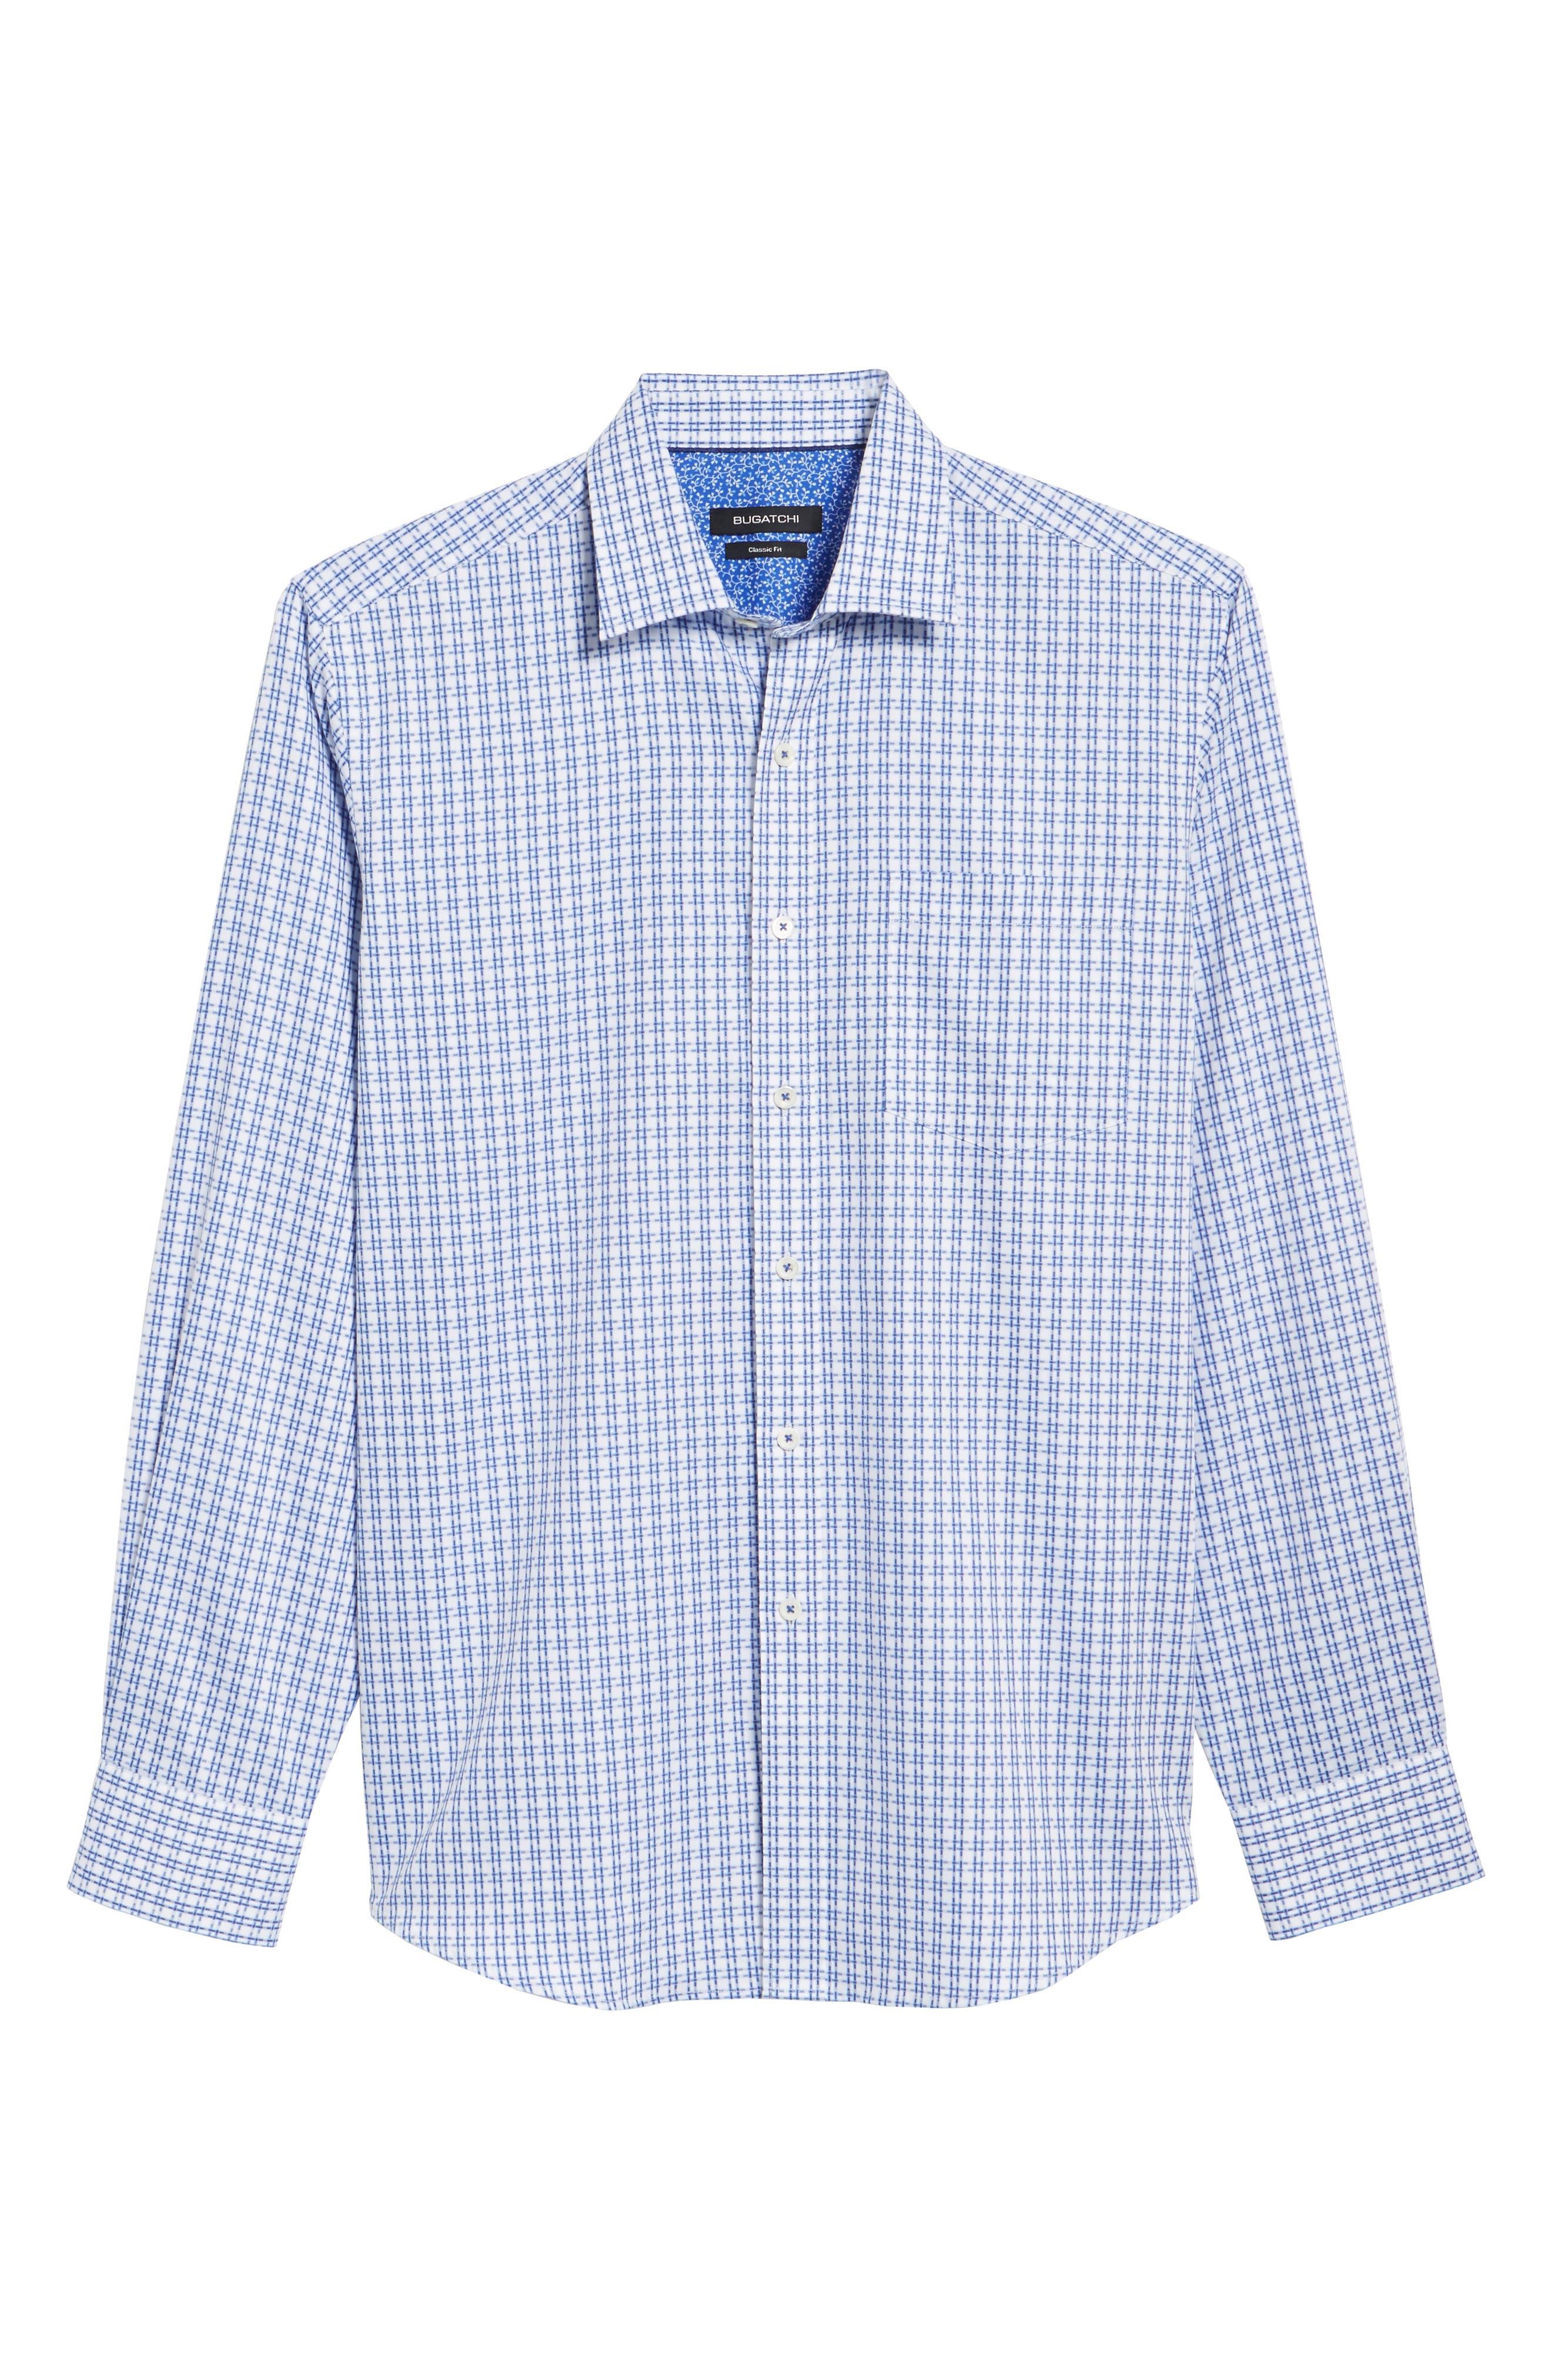 Double Stripe Classic Fit Sport Shirt,                             Alternate thumbnail 6, color,                             NAVY